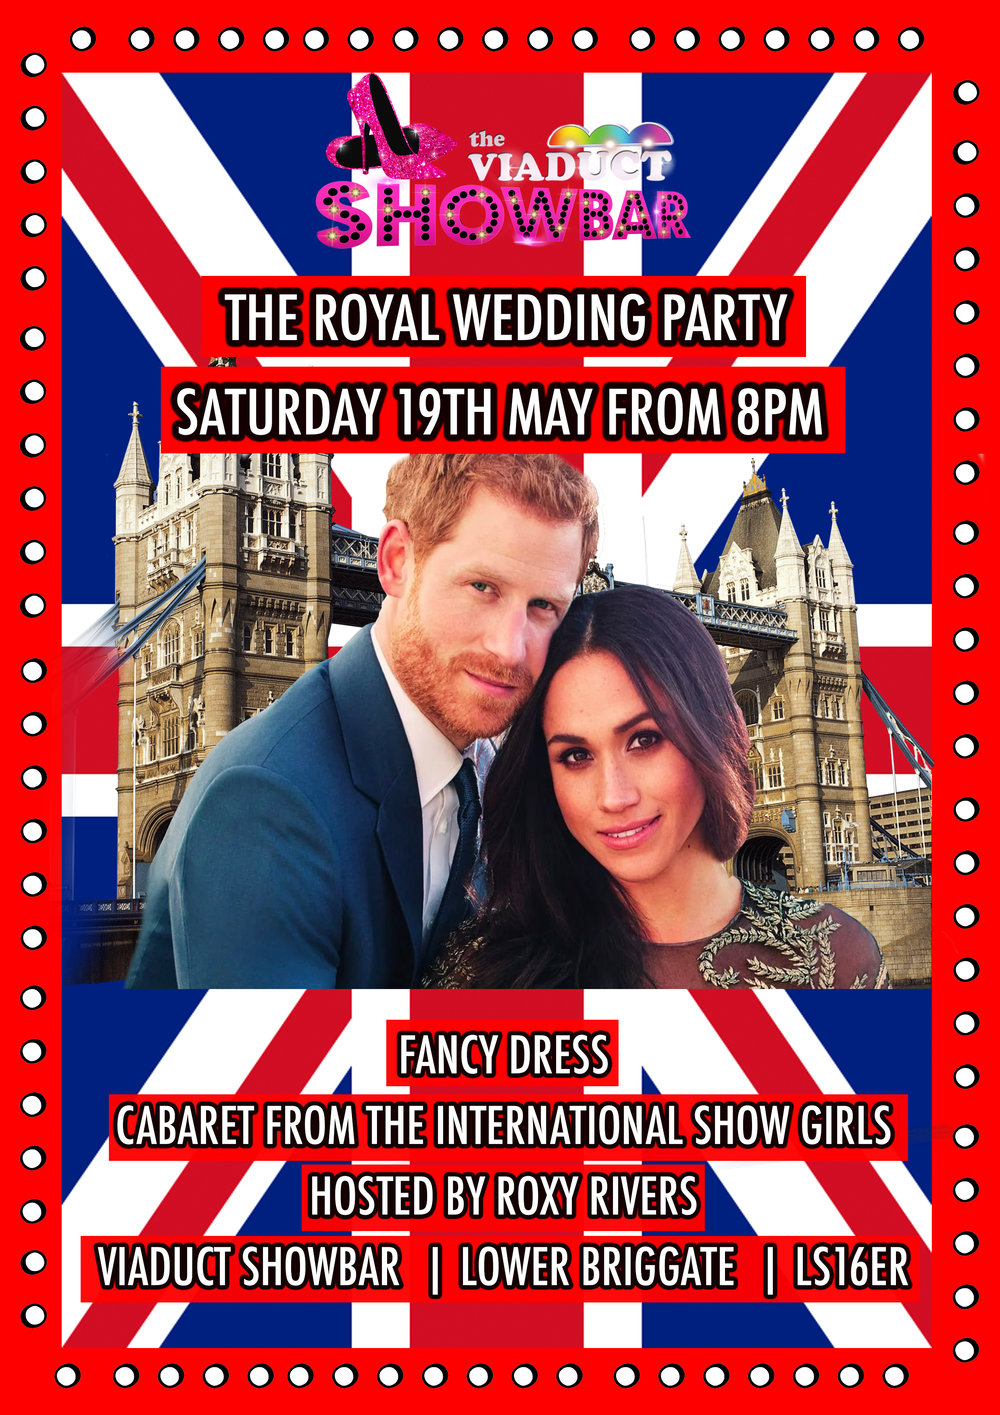 VIADUCT - THE ROYAL WEDDING PARTY BRITISH v1.jpg